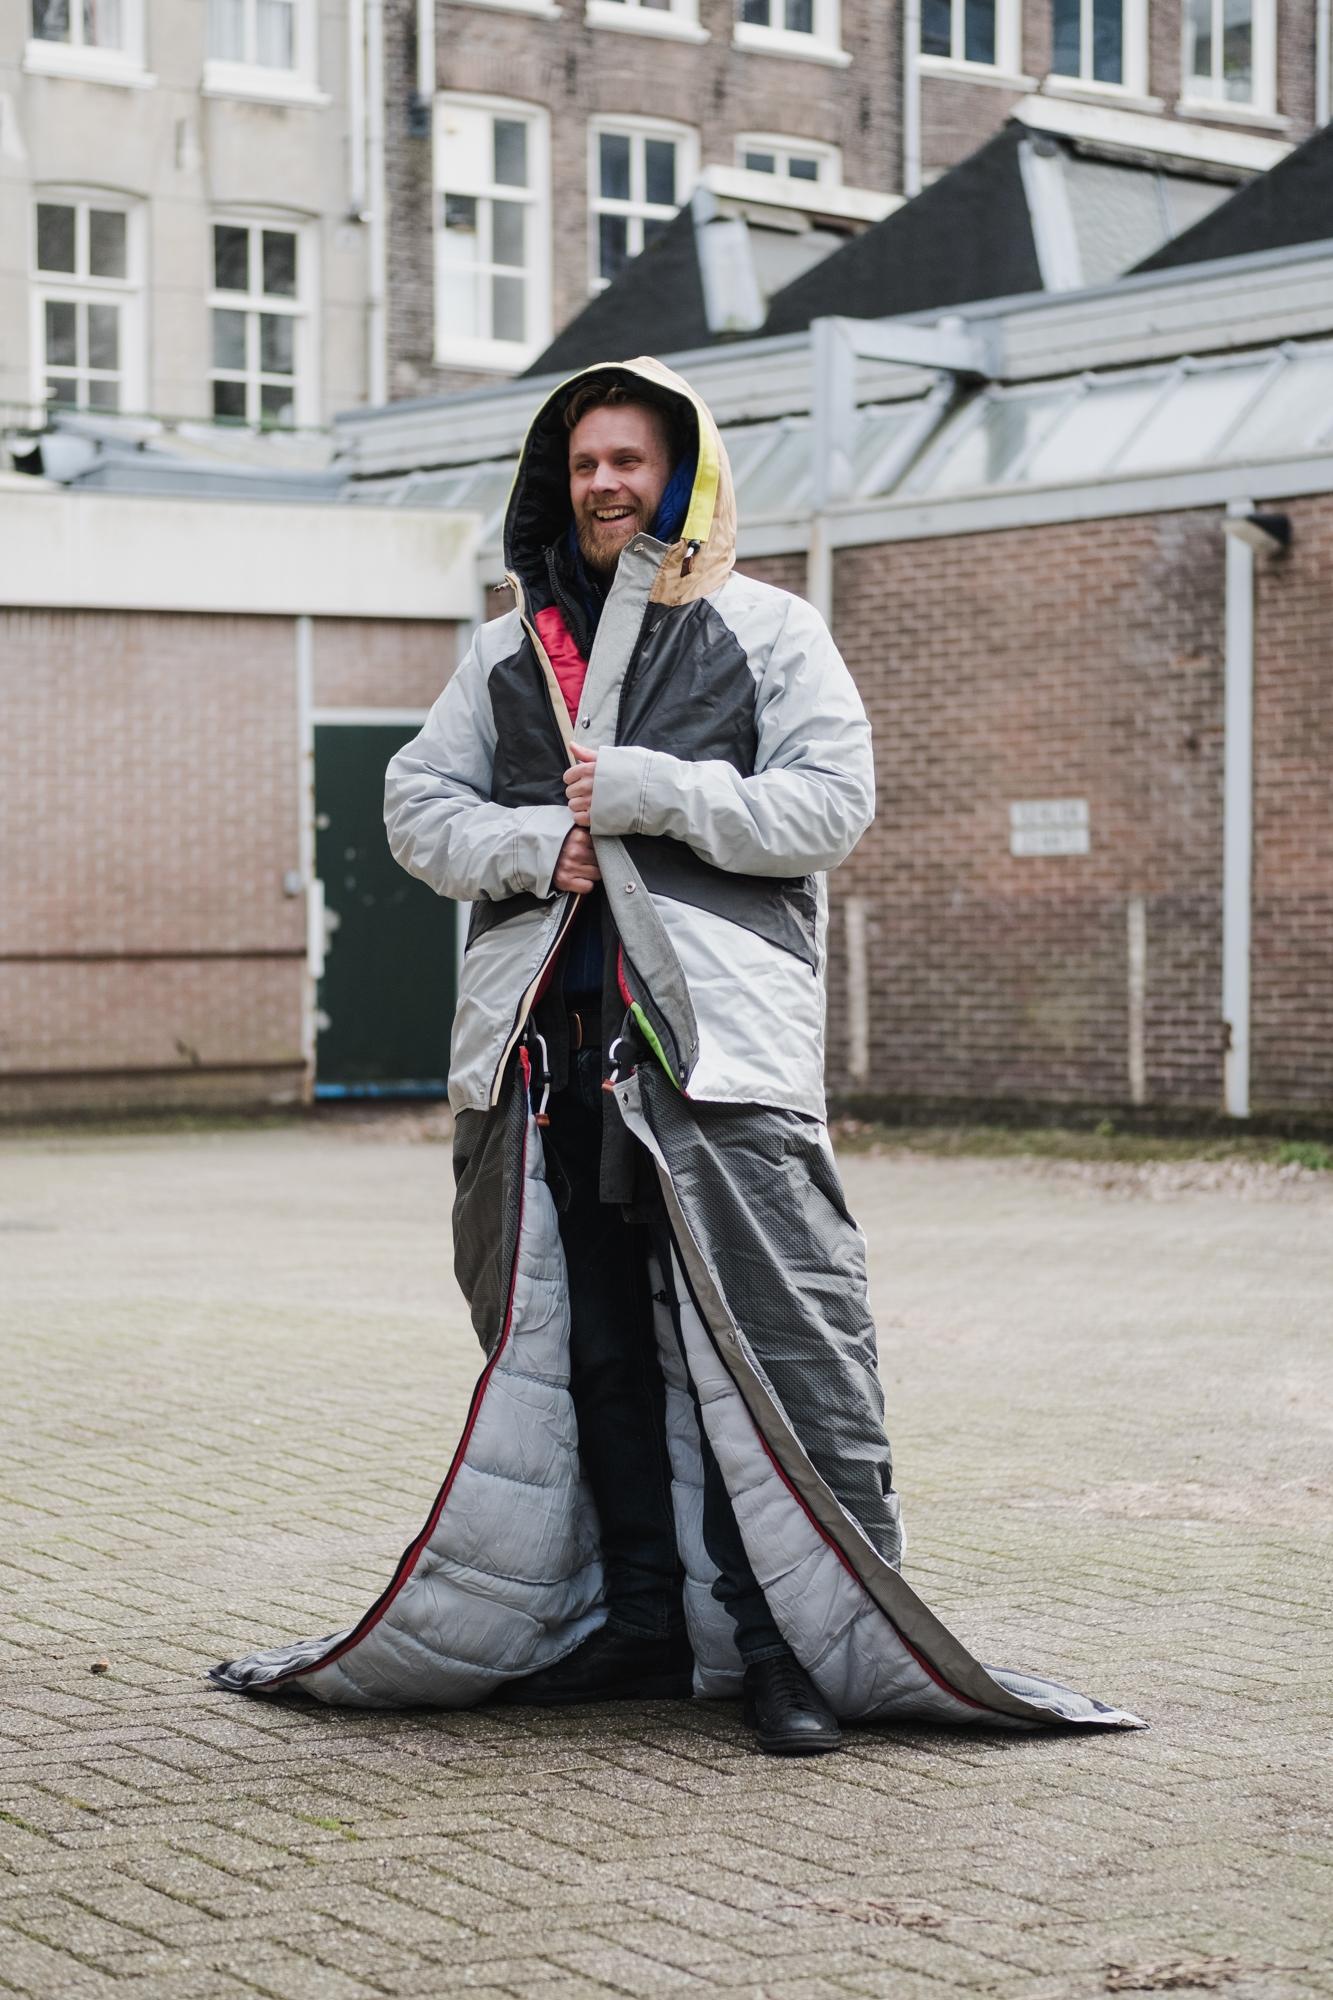 Sheltersuit bedrijf beschermt kwetsbare daklozen jassen